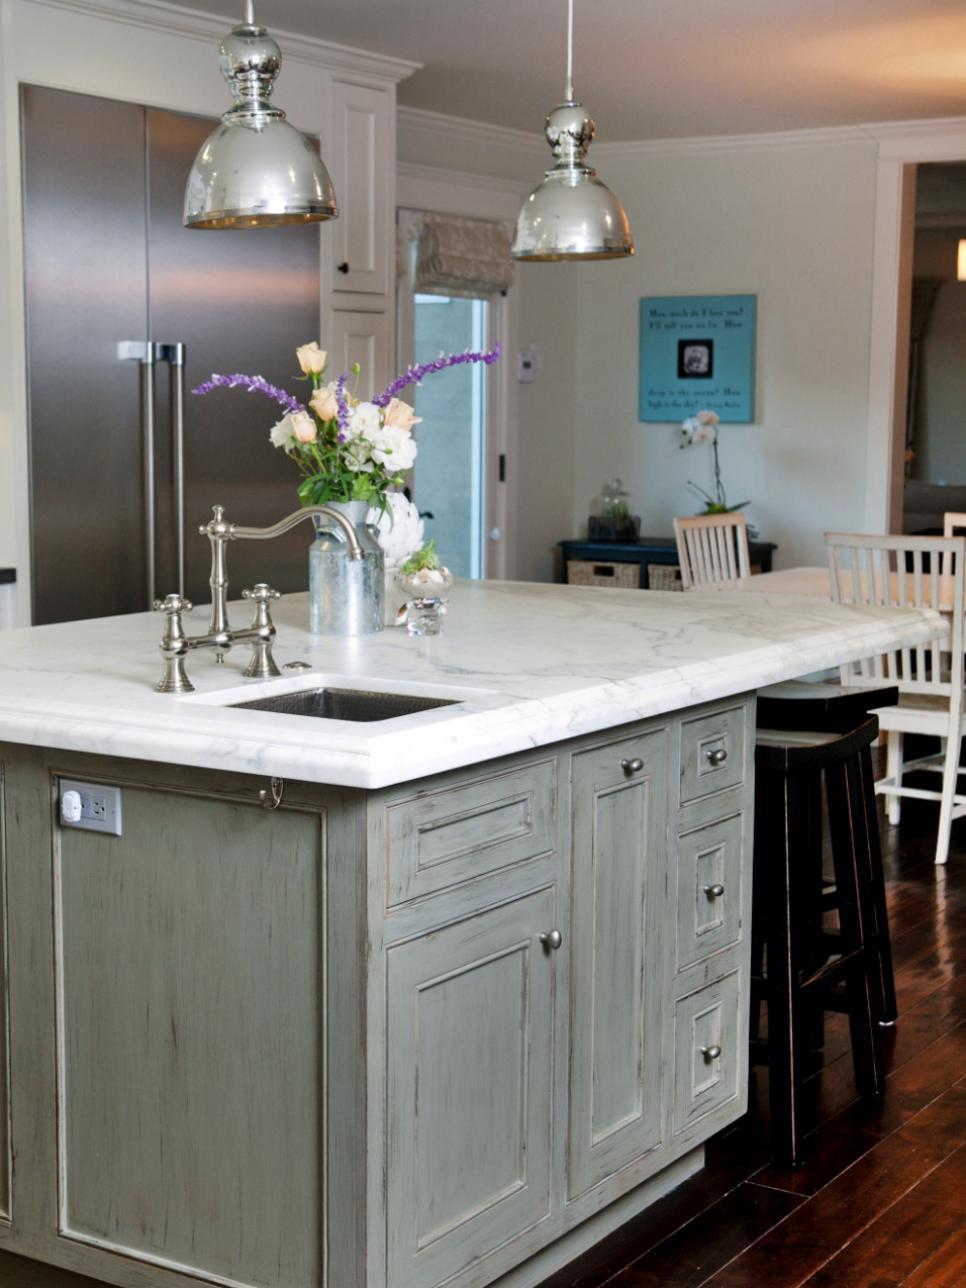 Original_Darci-Goodman-gray-coastal-kitchen_s3x4.jpg.rend.hgtvcom.966.1288.jpeg